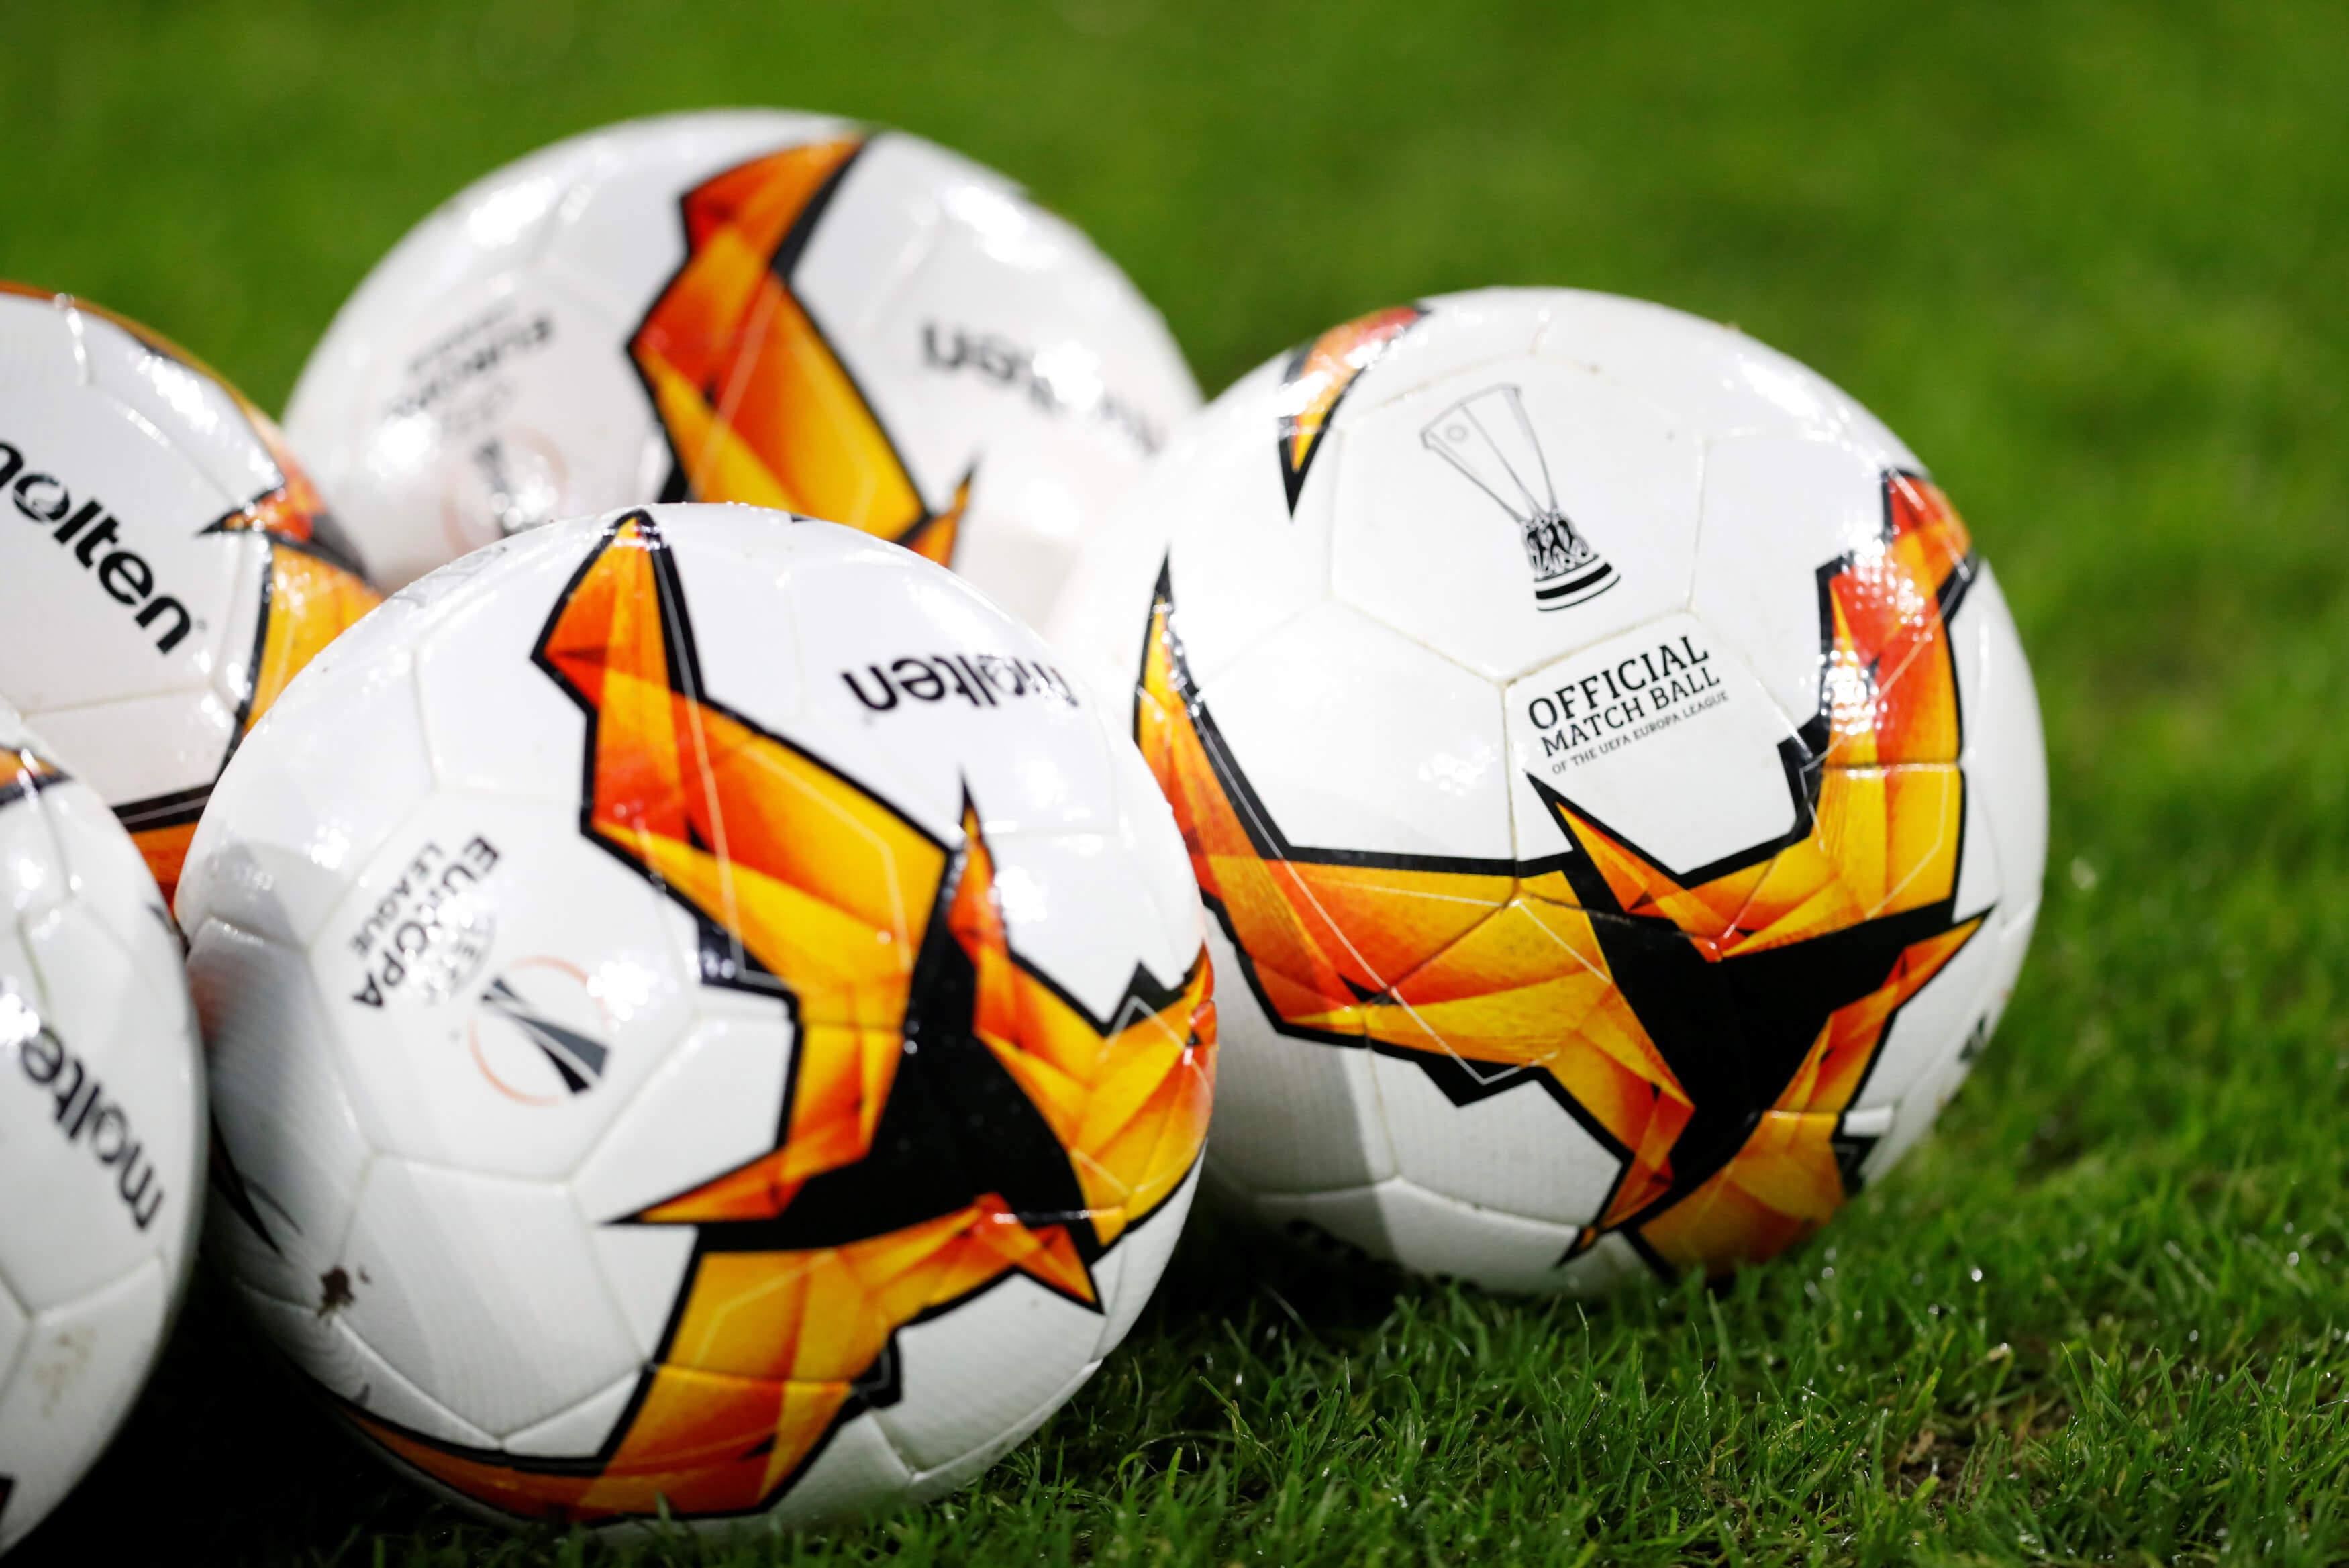 Europa League: Οι αντίπαλοι ΑΕΚ και ΠΑΟΚ! Όλα τα ζευγάρια στα πλέι οφ